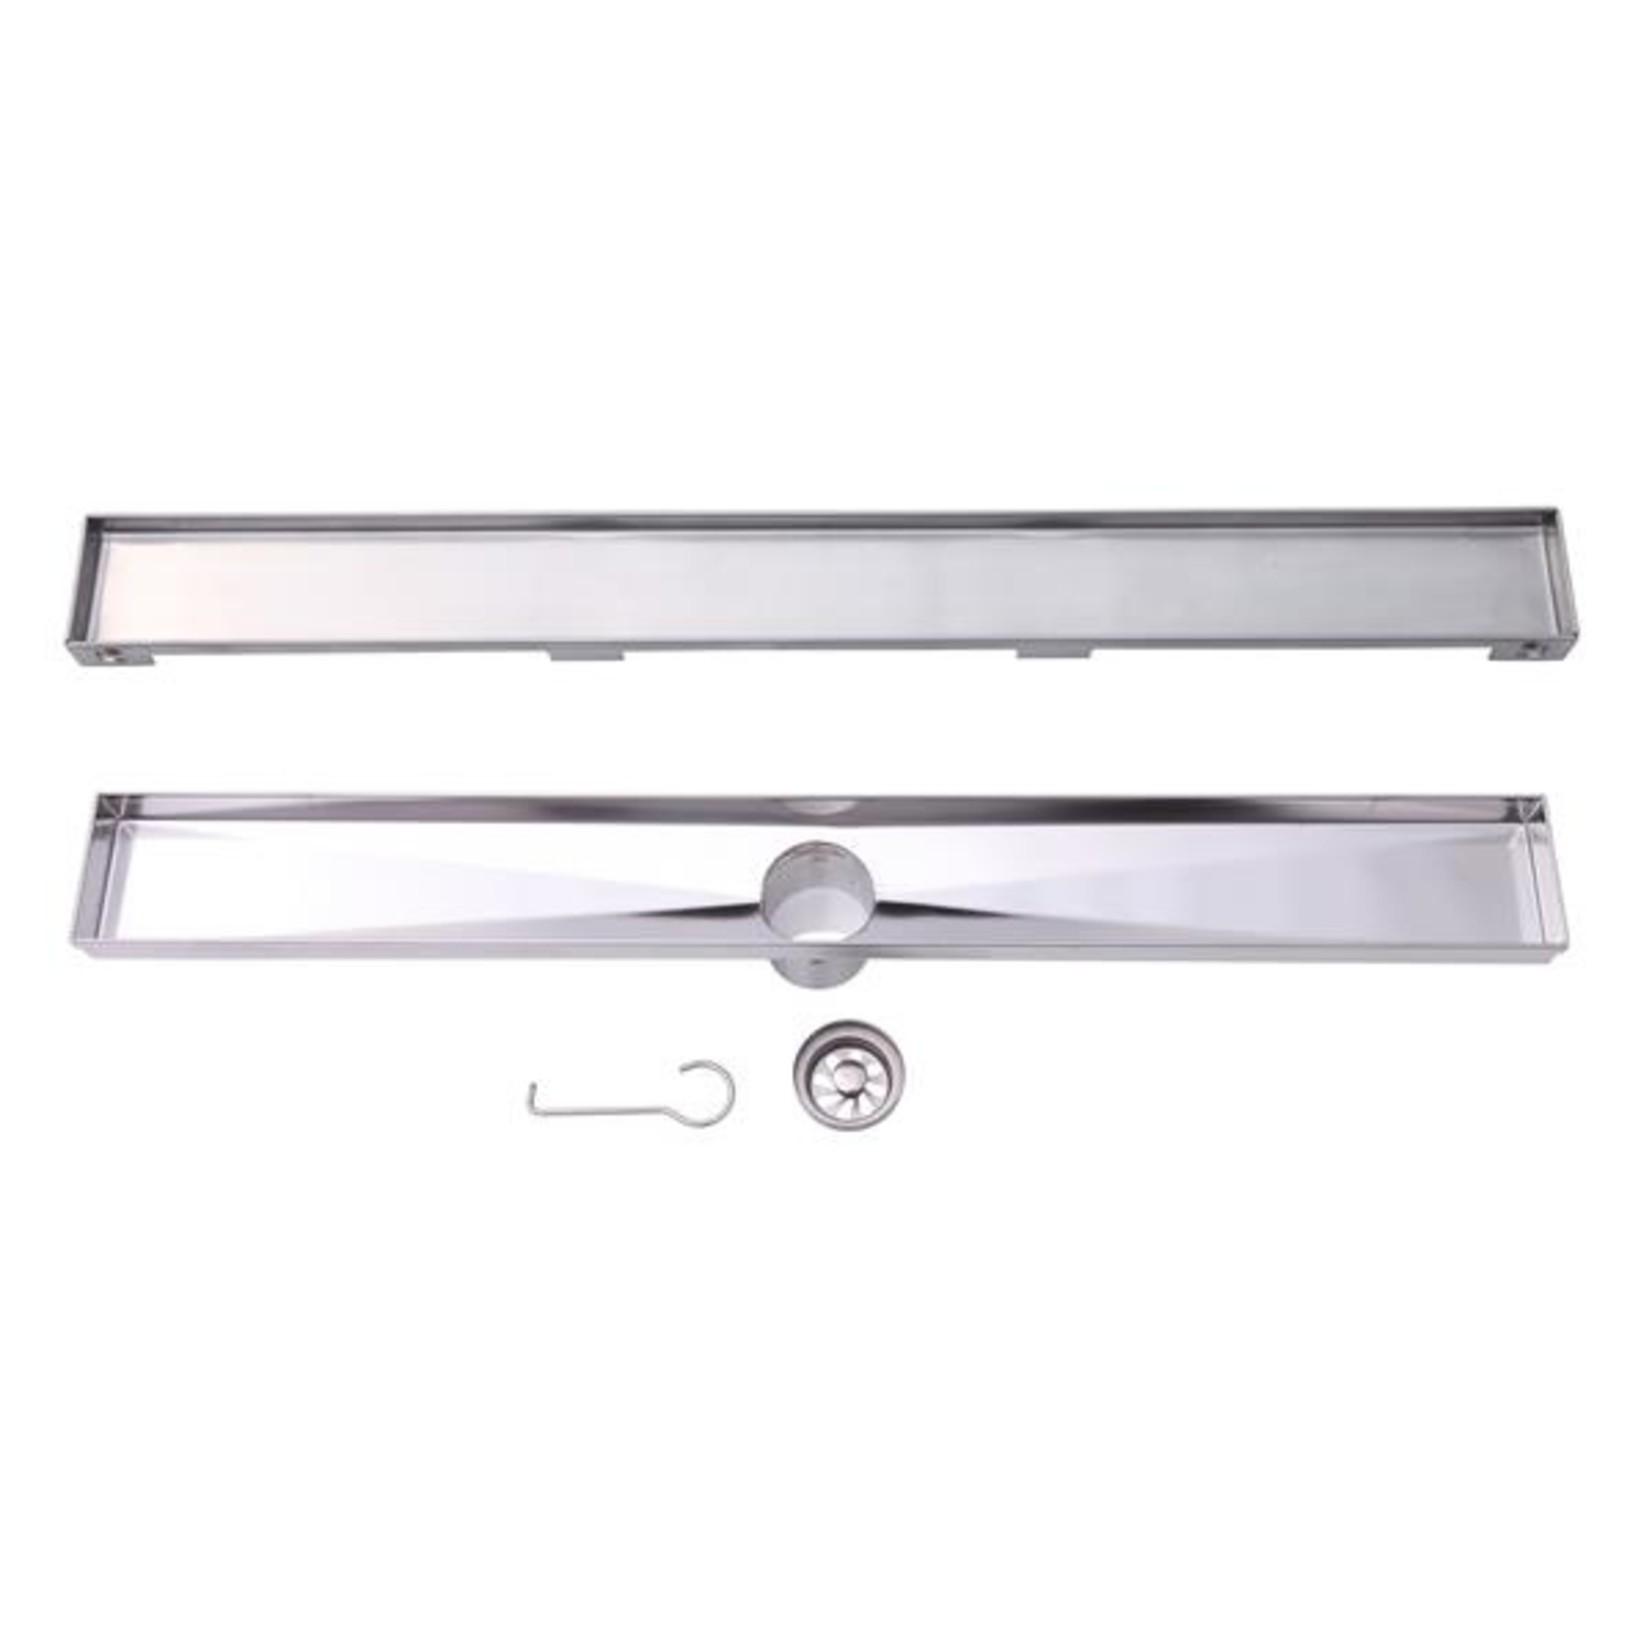 Drain lineaire en acier inoxidable model LVA